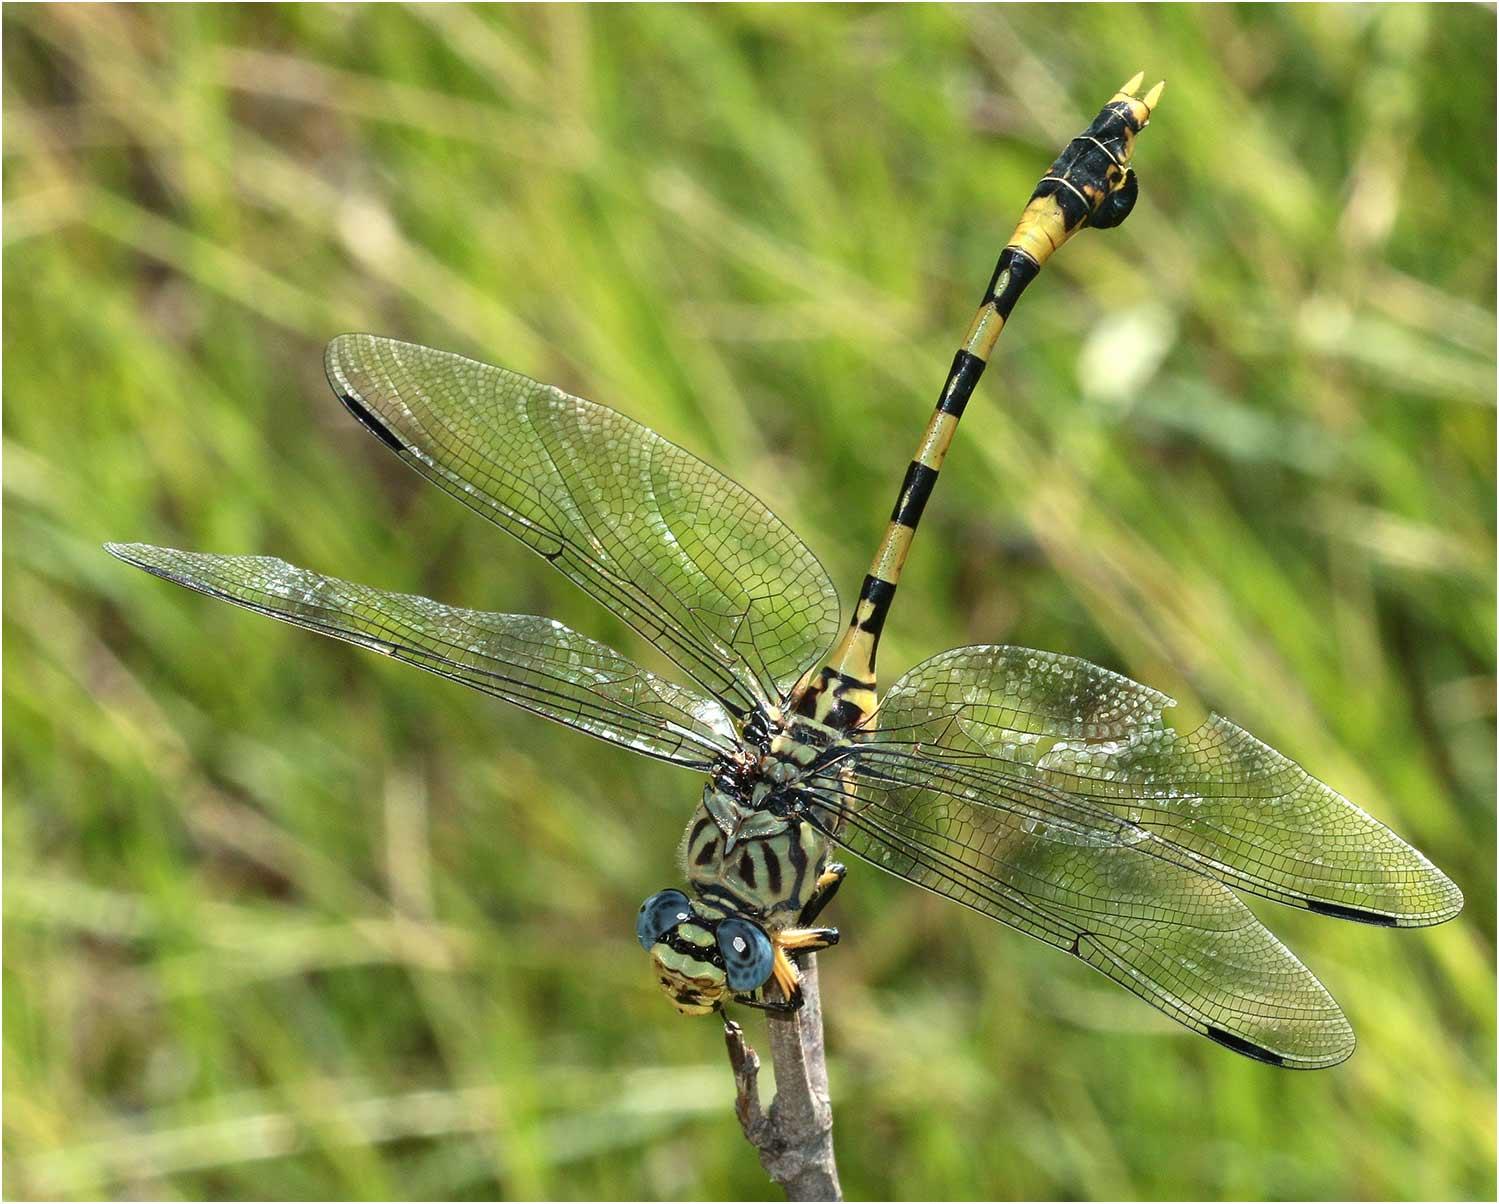 Ictinogomphus ferox femelle, Namibie, Rundu, 10/02/2020